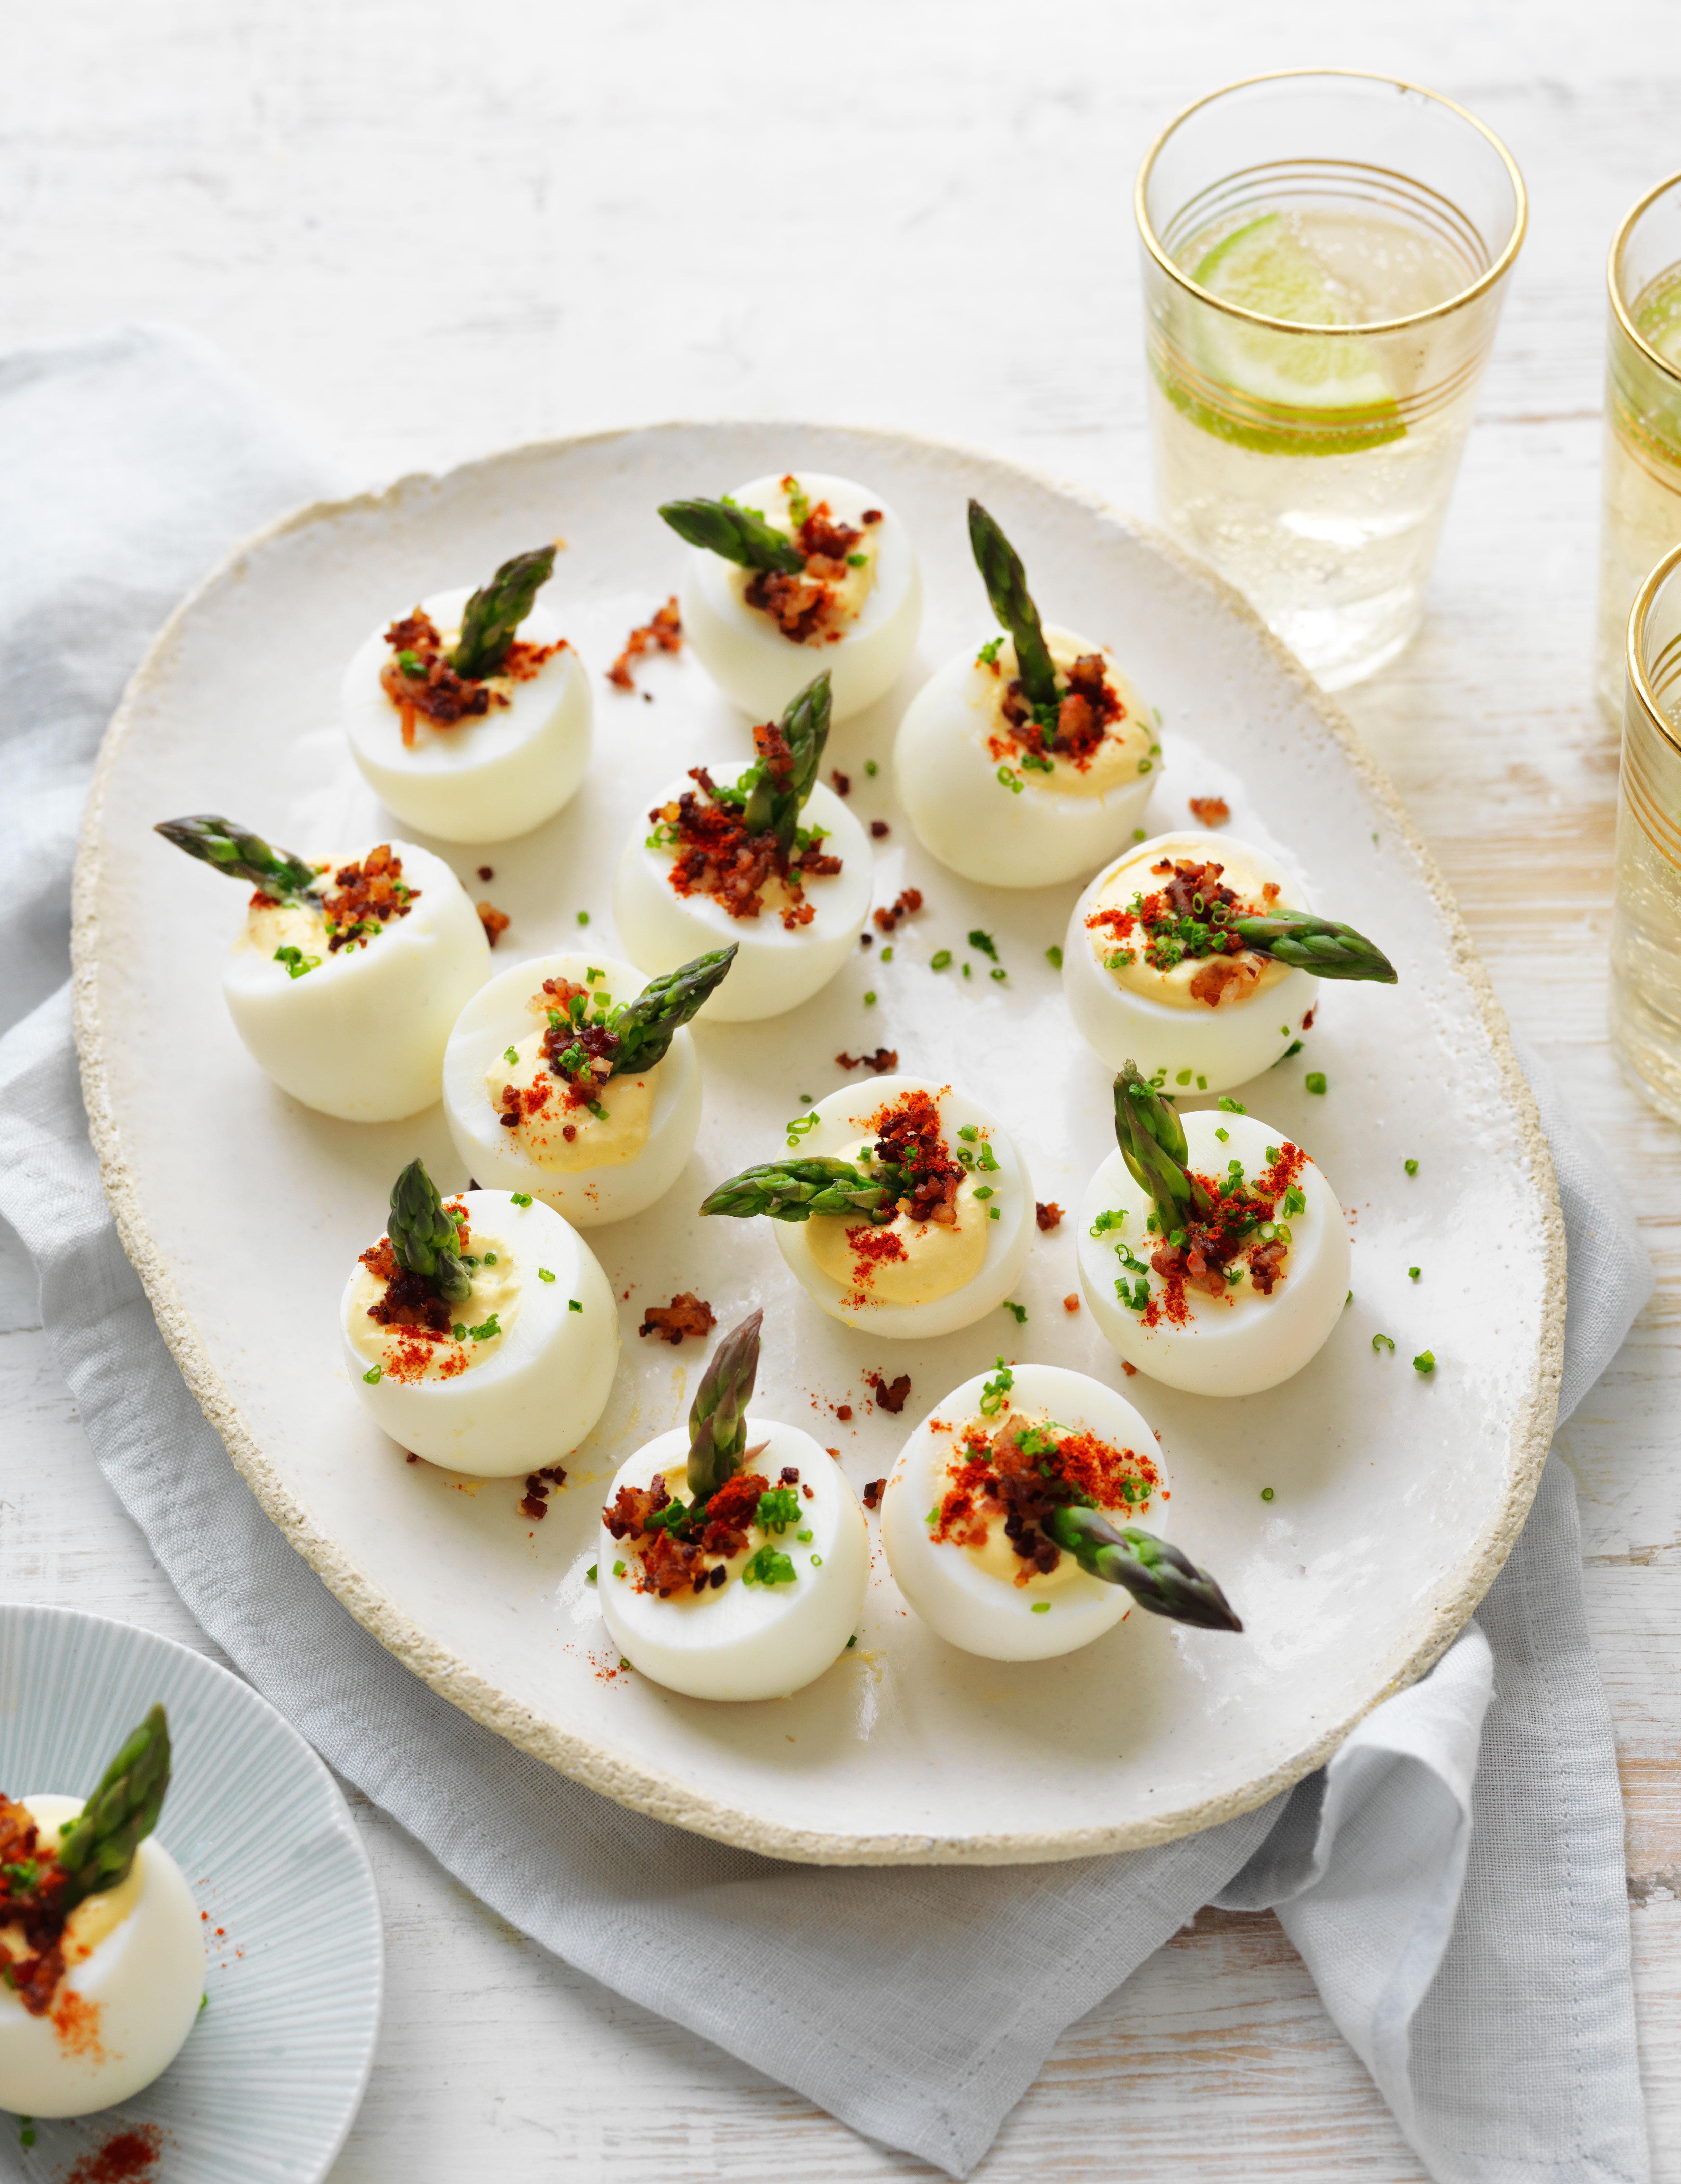 Modern devilled egg recipe